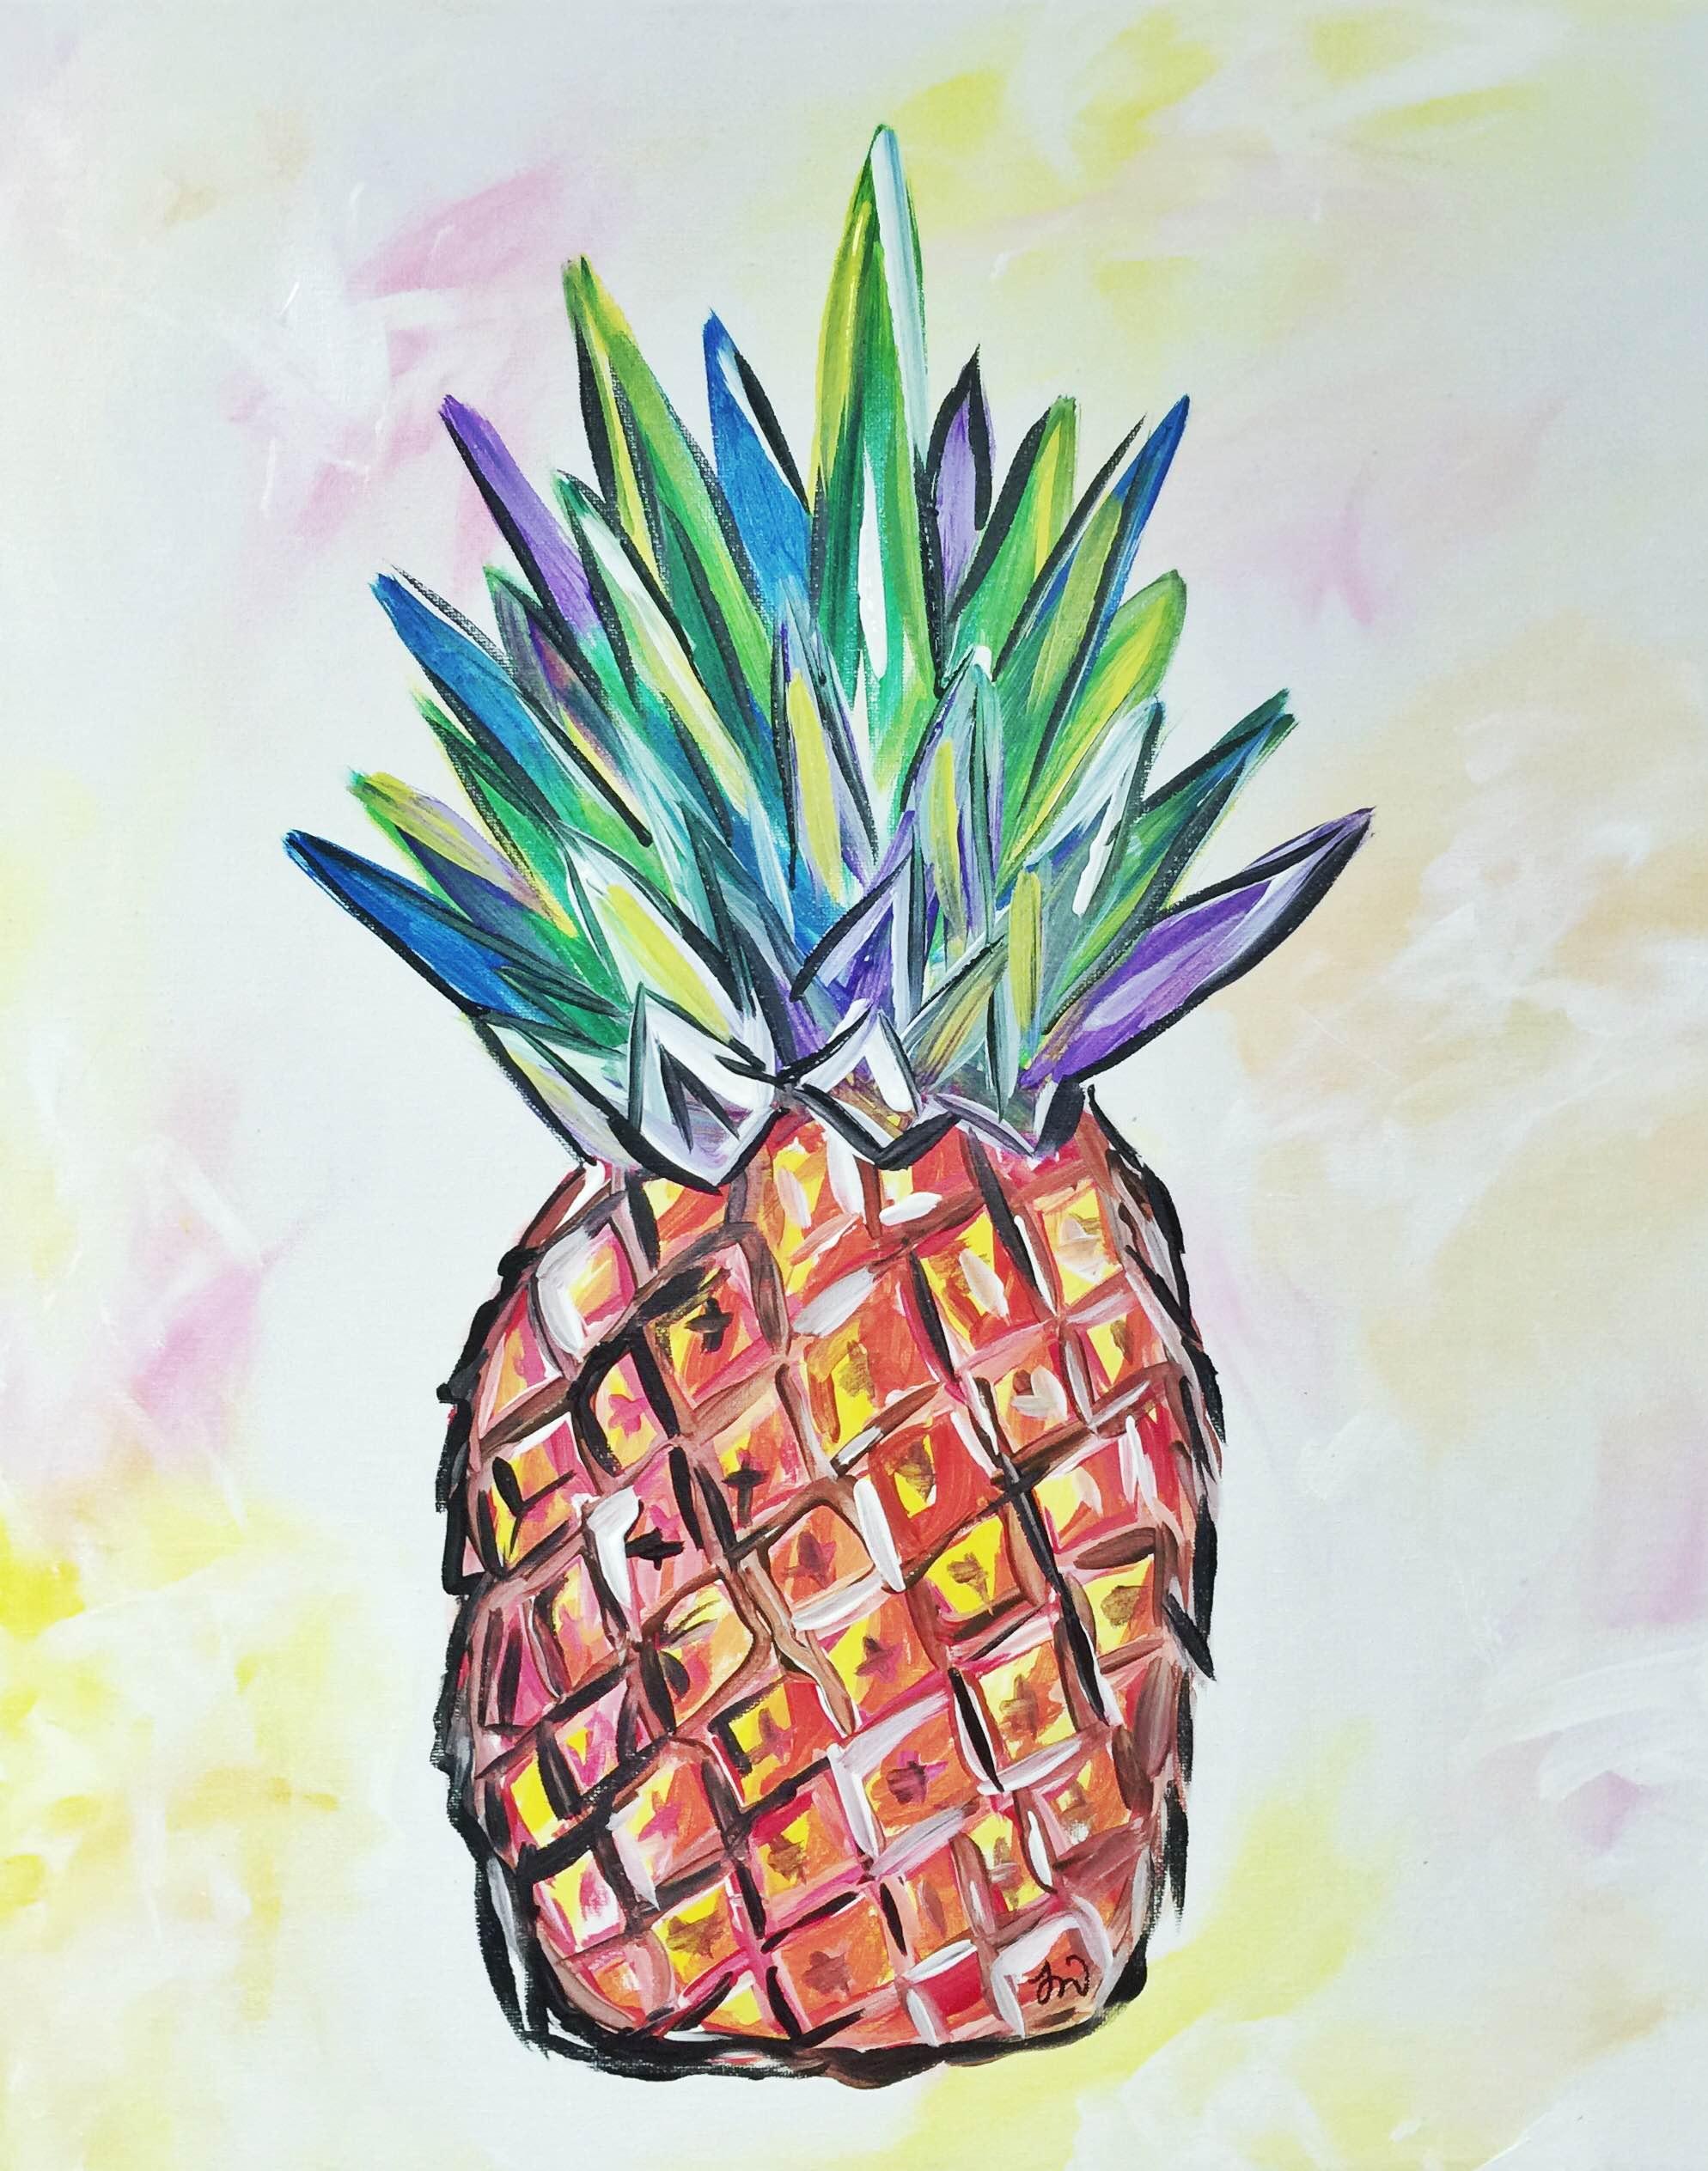 morehead_joshua Wade_sup fresh fruit.JPG